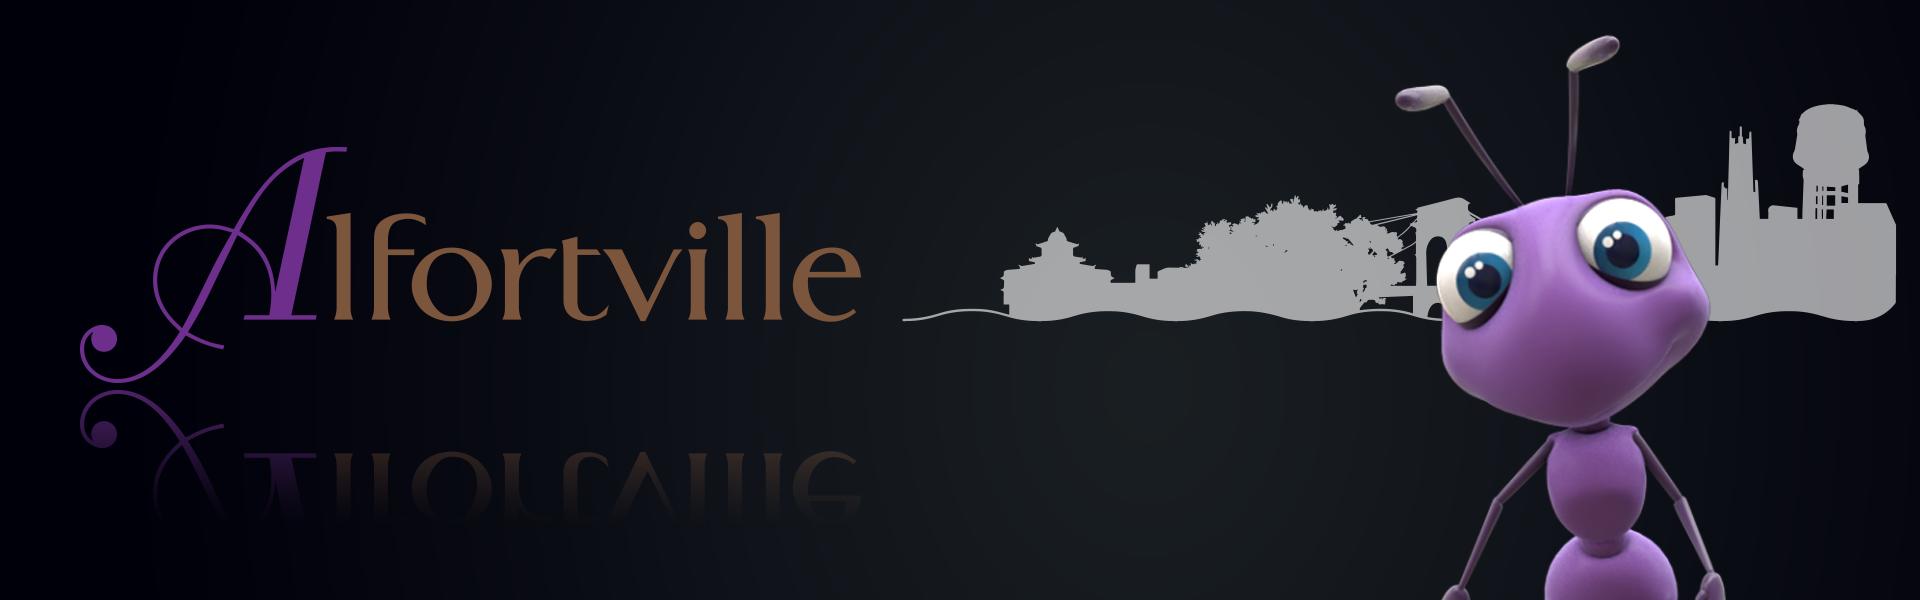 hélice Alfortville